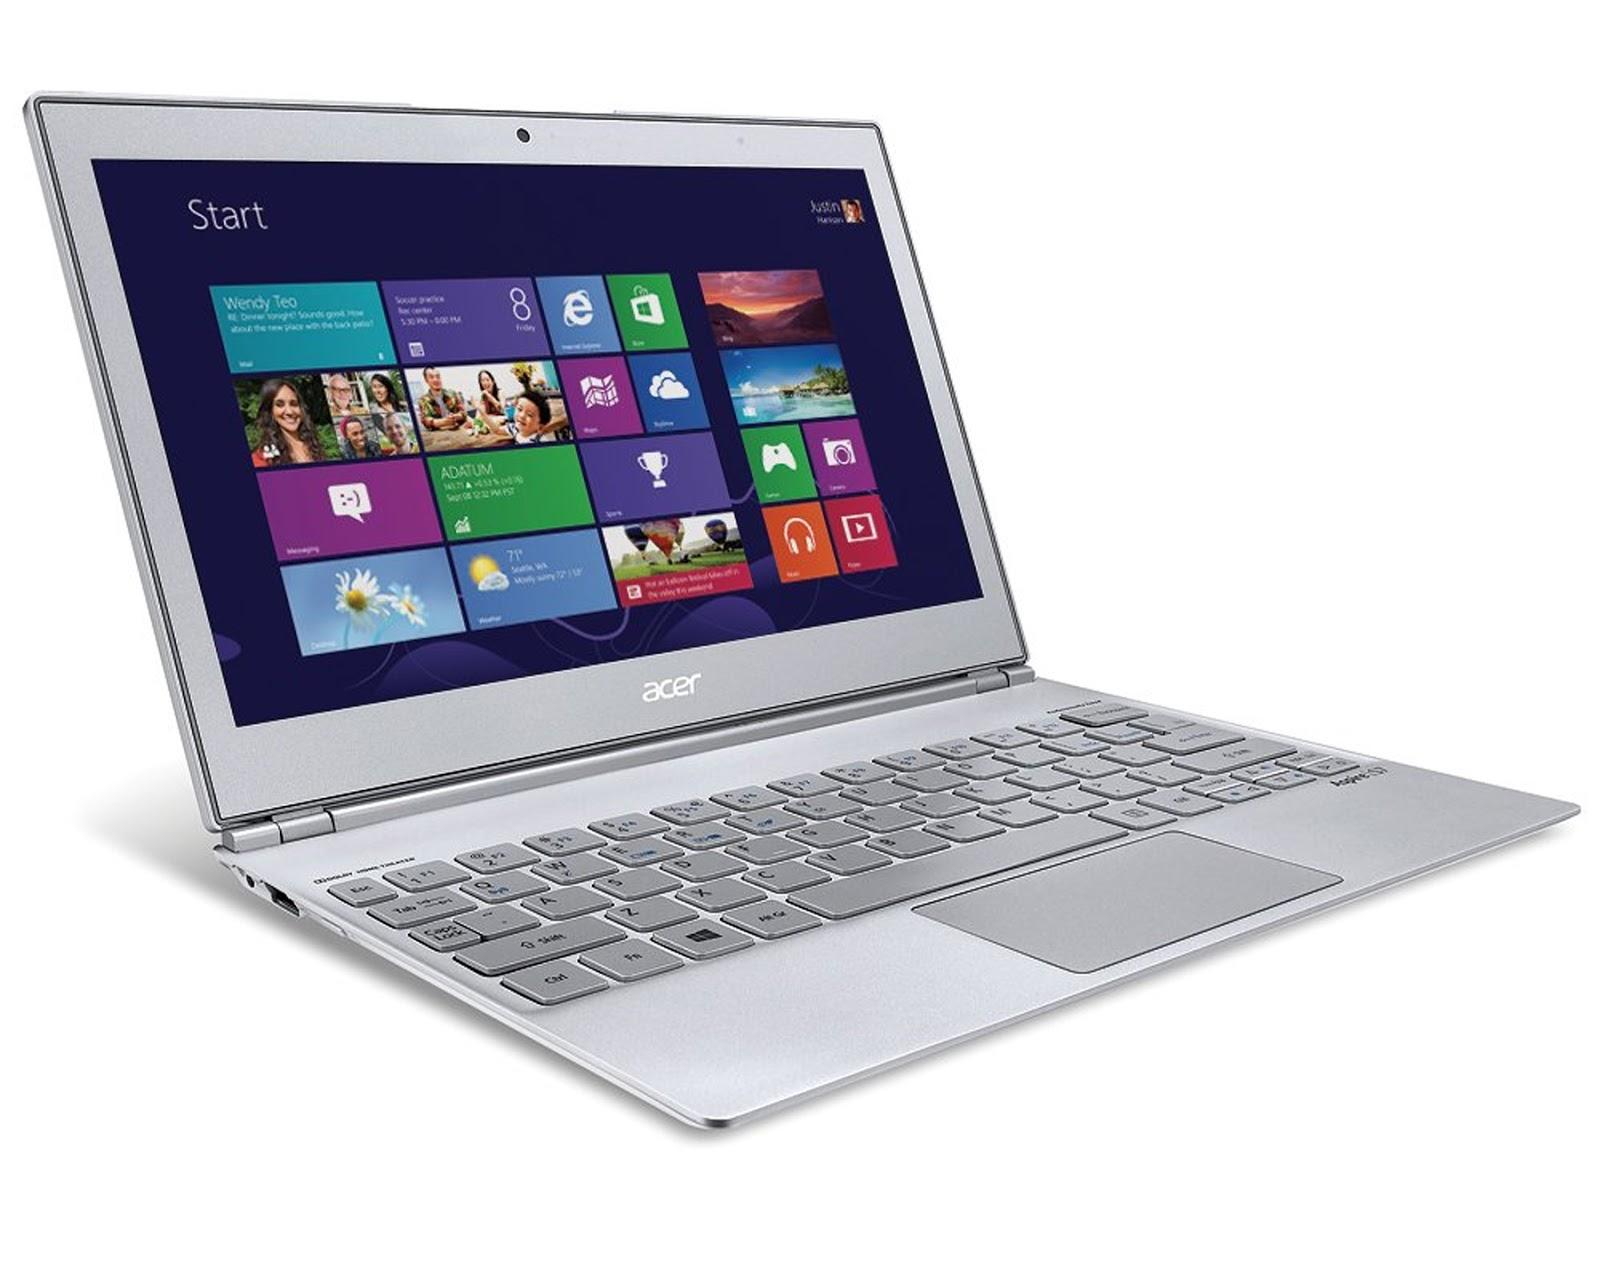 Cara Mudah Mengetahui Spesifikasi Laptop / PC